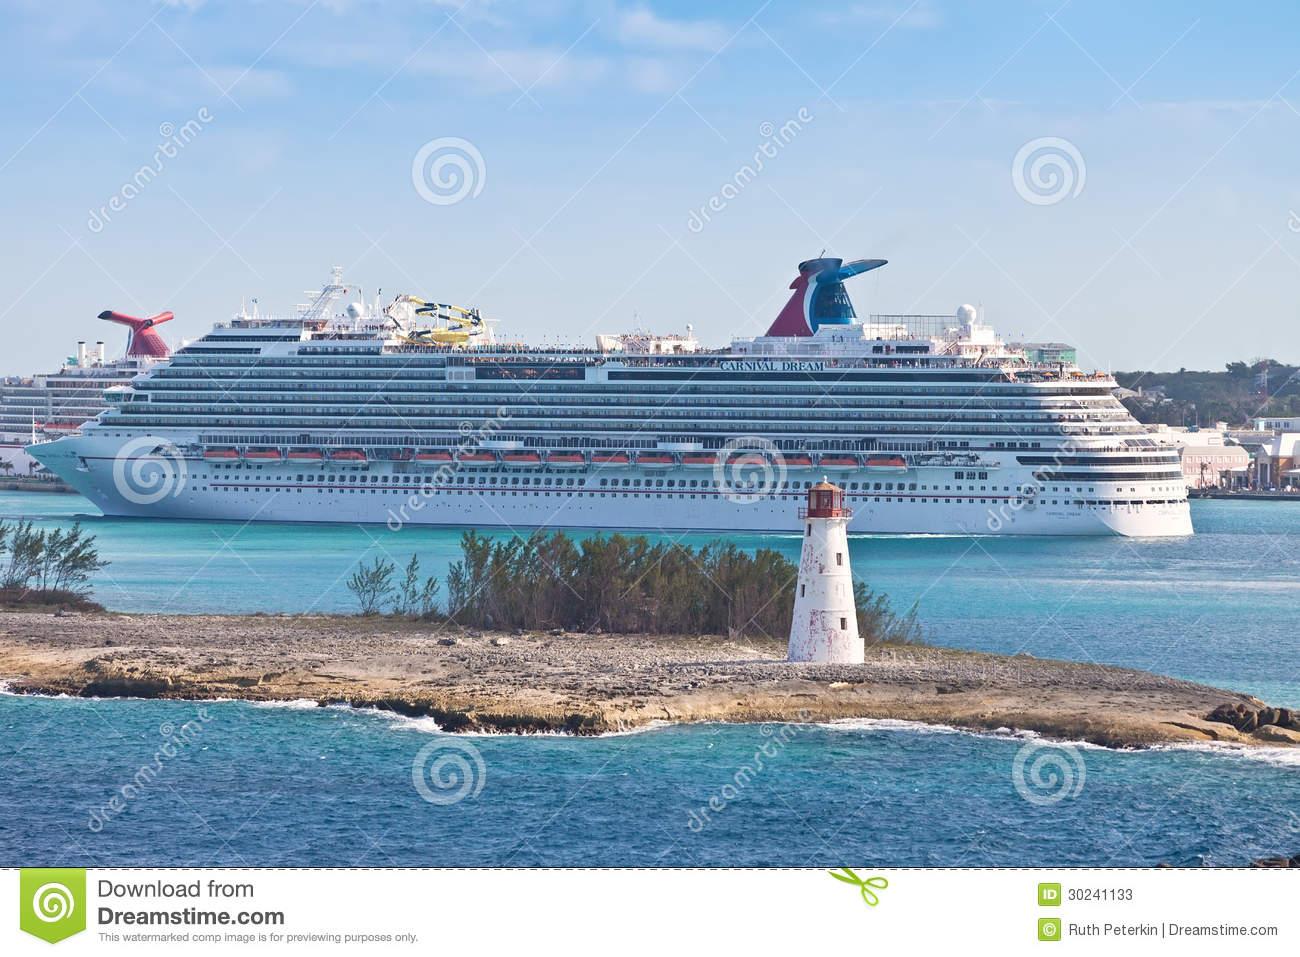 Cute Cruise Ship Quotes Quotesgram: Bahamas Famous Quotes. QuotesGram